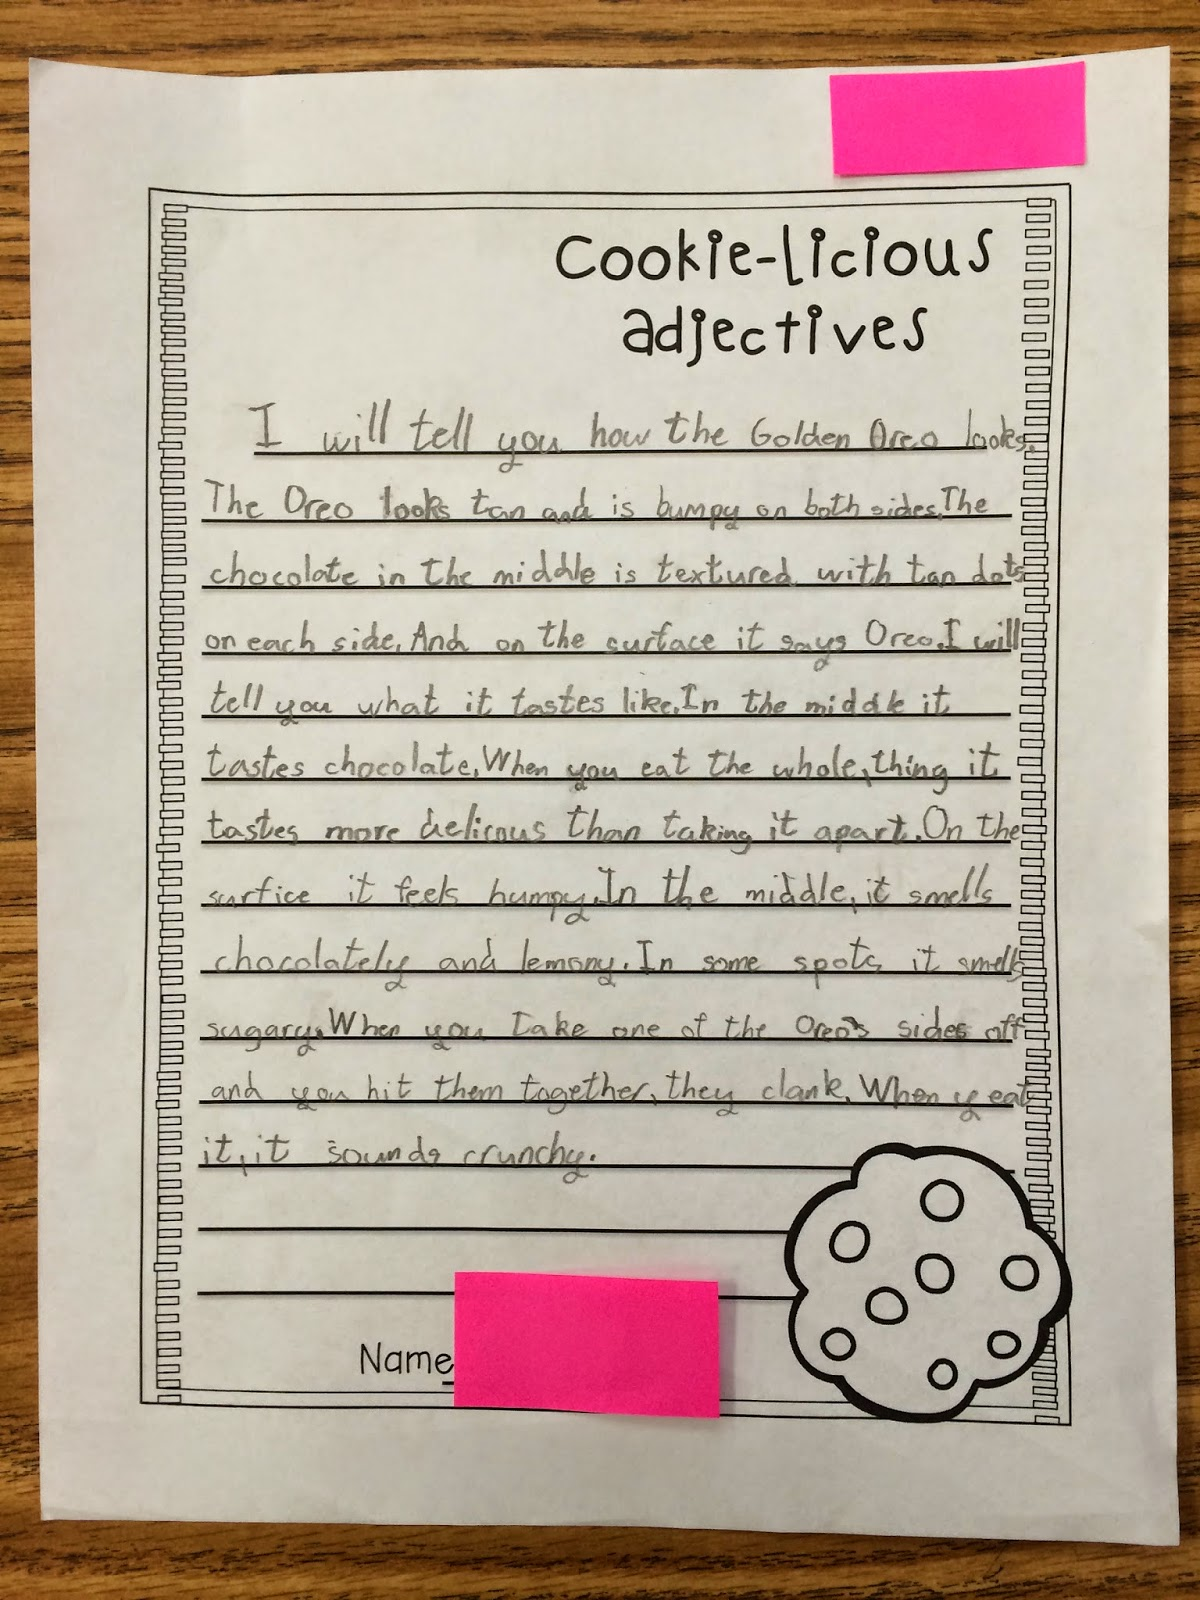 descriptive essay on cookies 91 121 113 106 descriptive essay on cookies